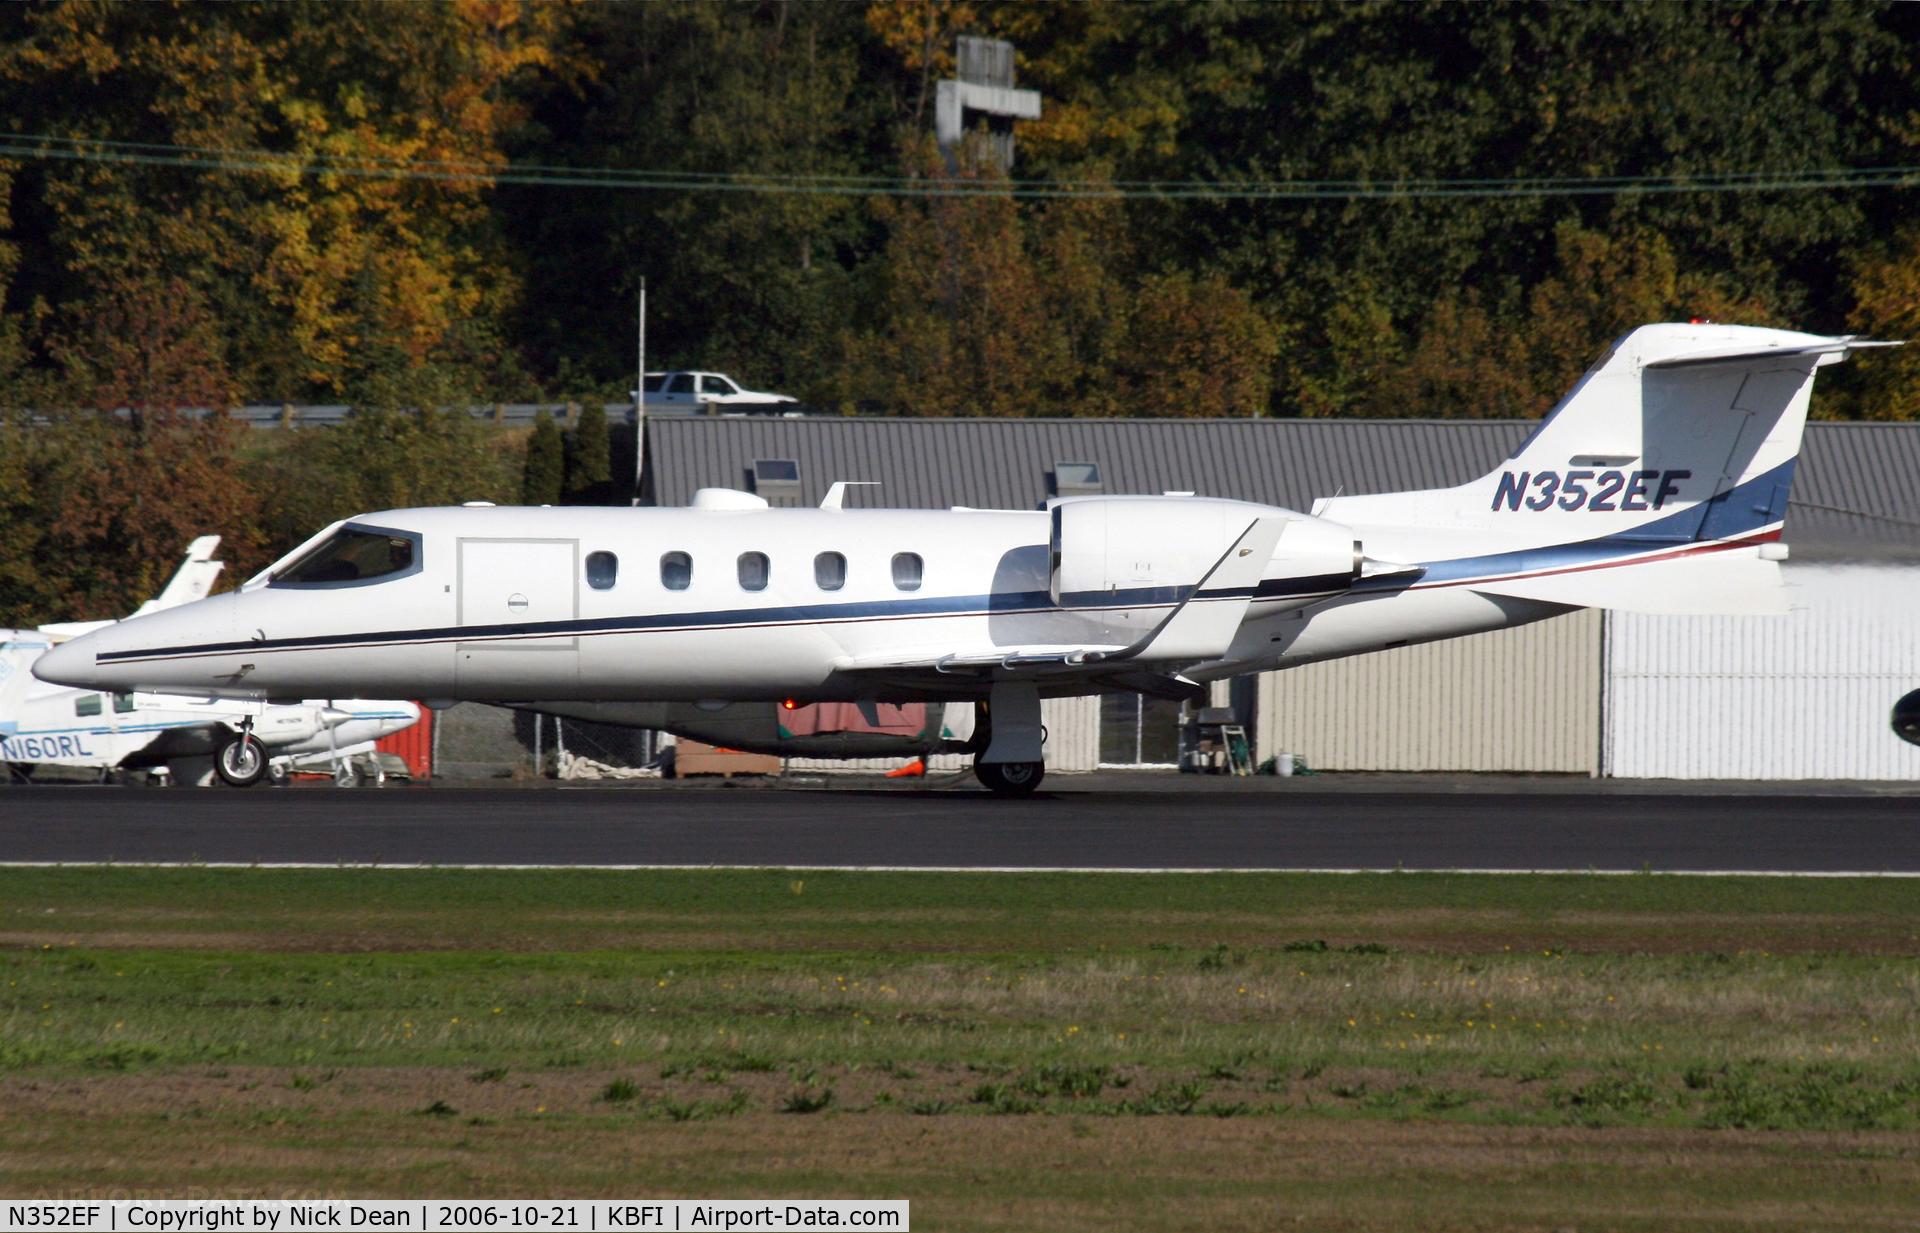 N352EF, 1992 Learjet Inc 31A C/N 046, KBFI